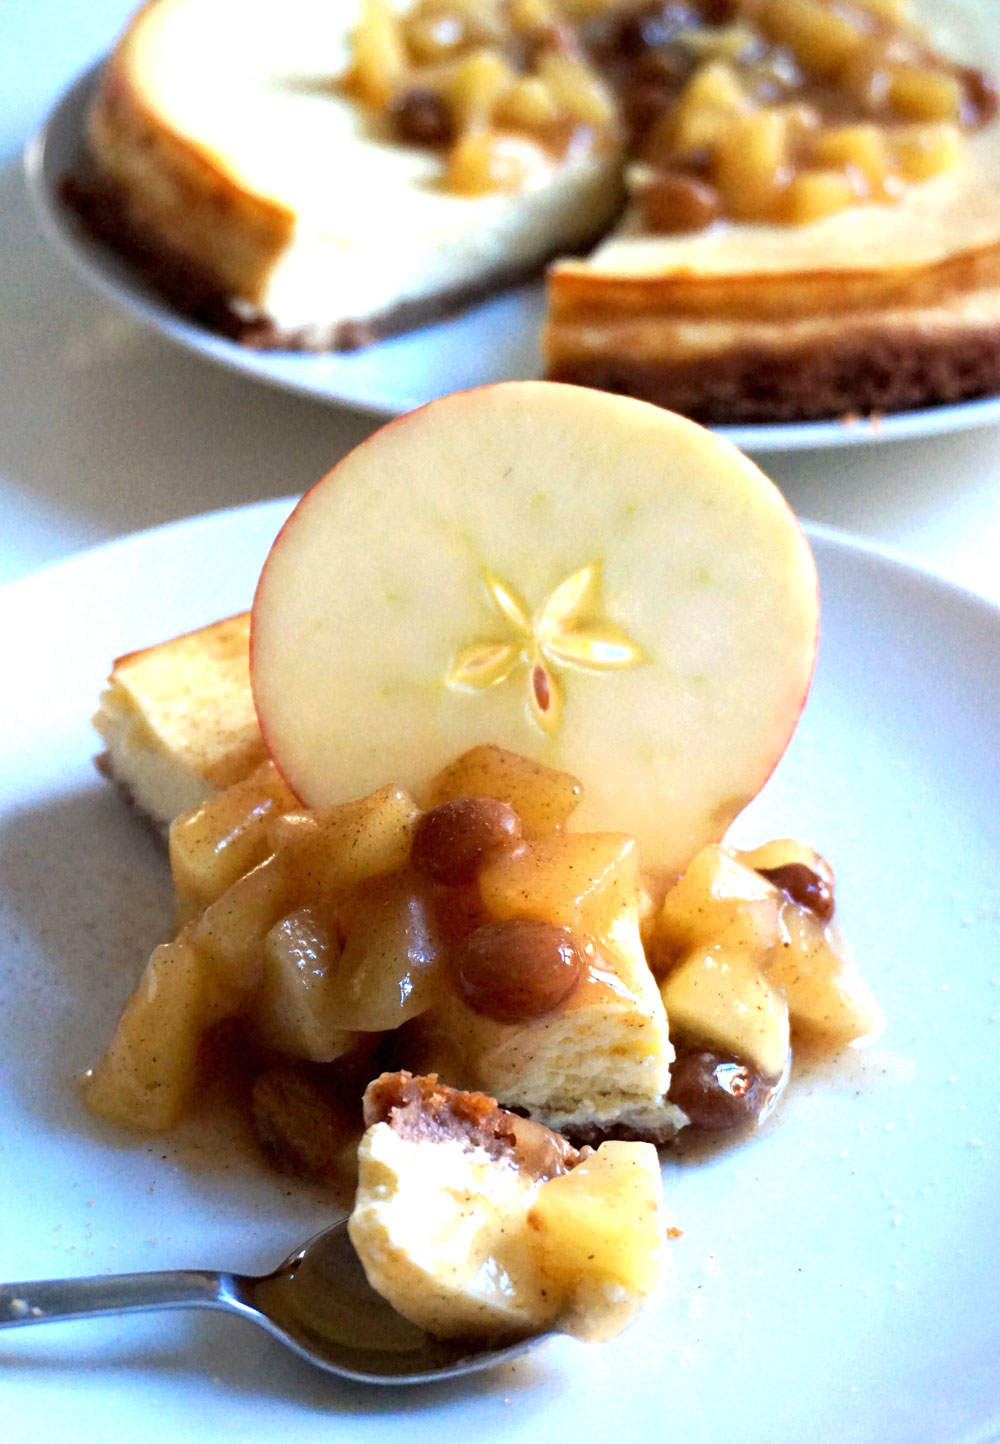 rezept-backen-cheesecake-bratapfelsoße-zimt